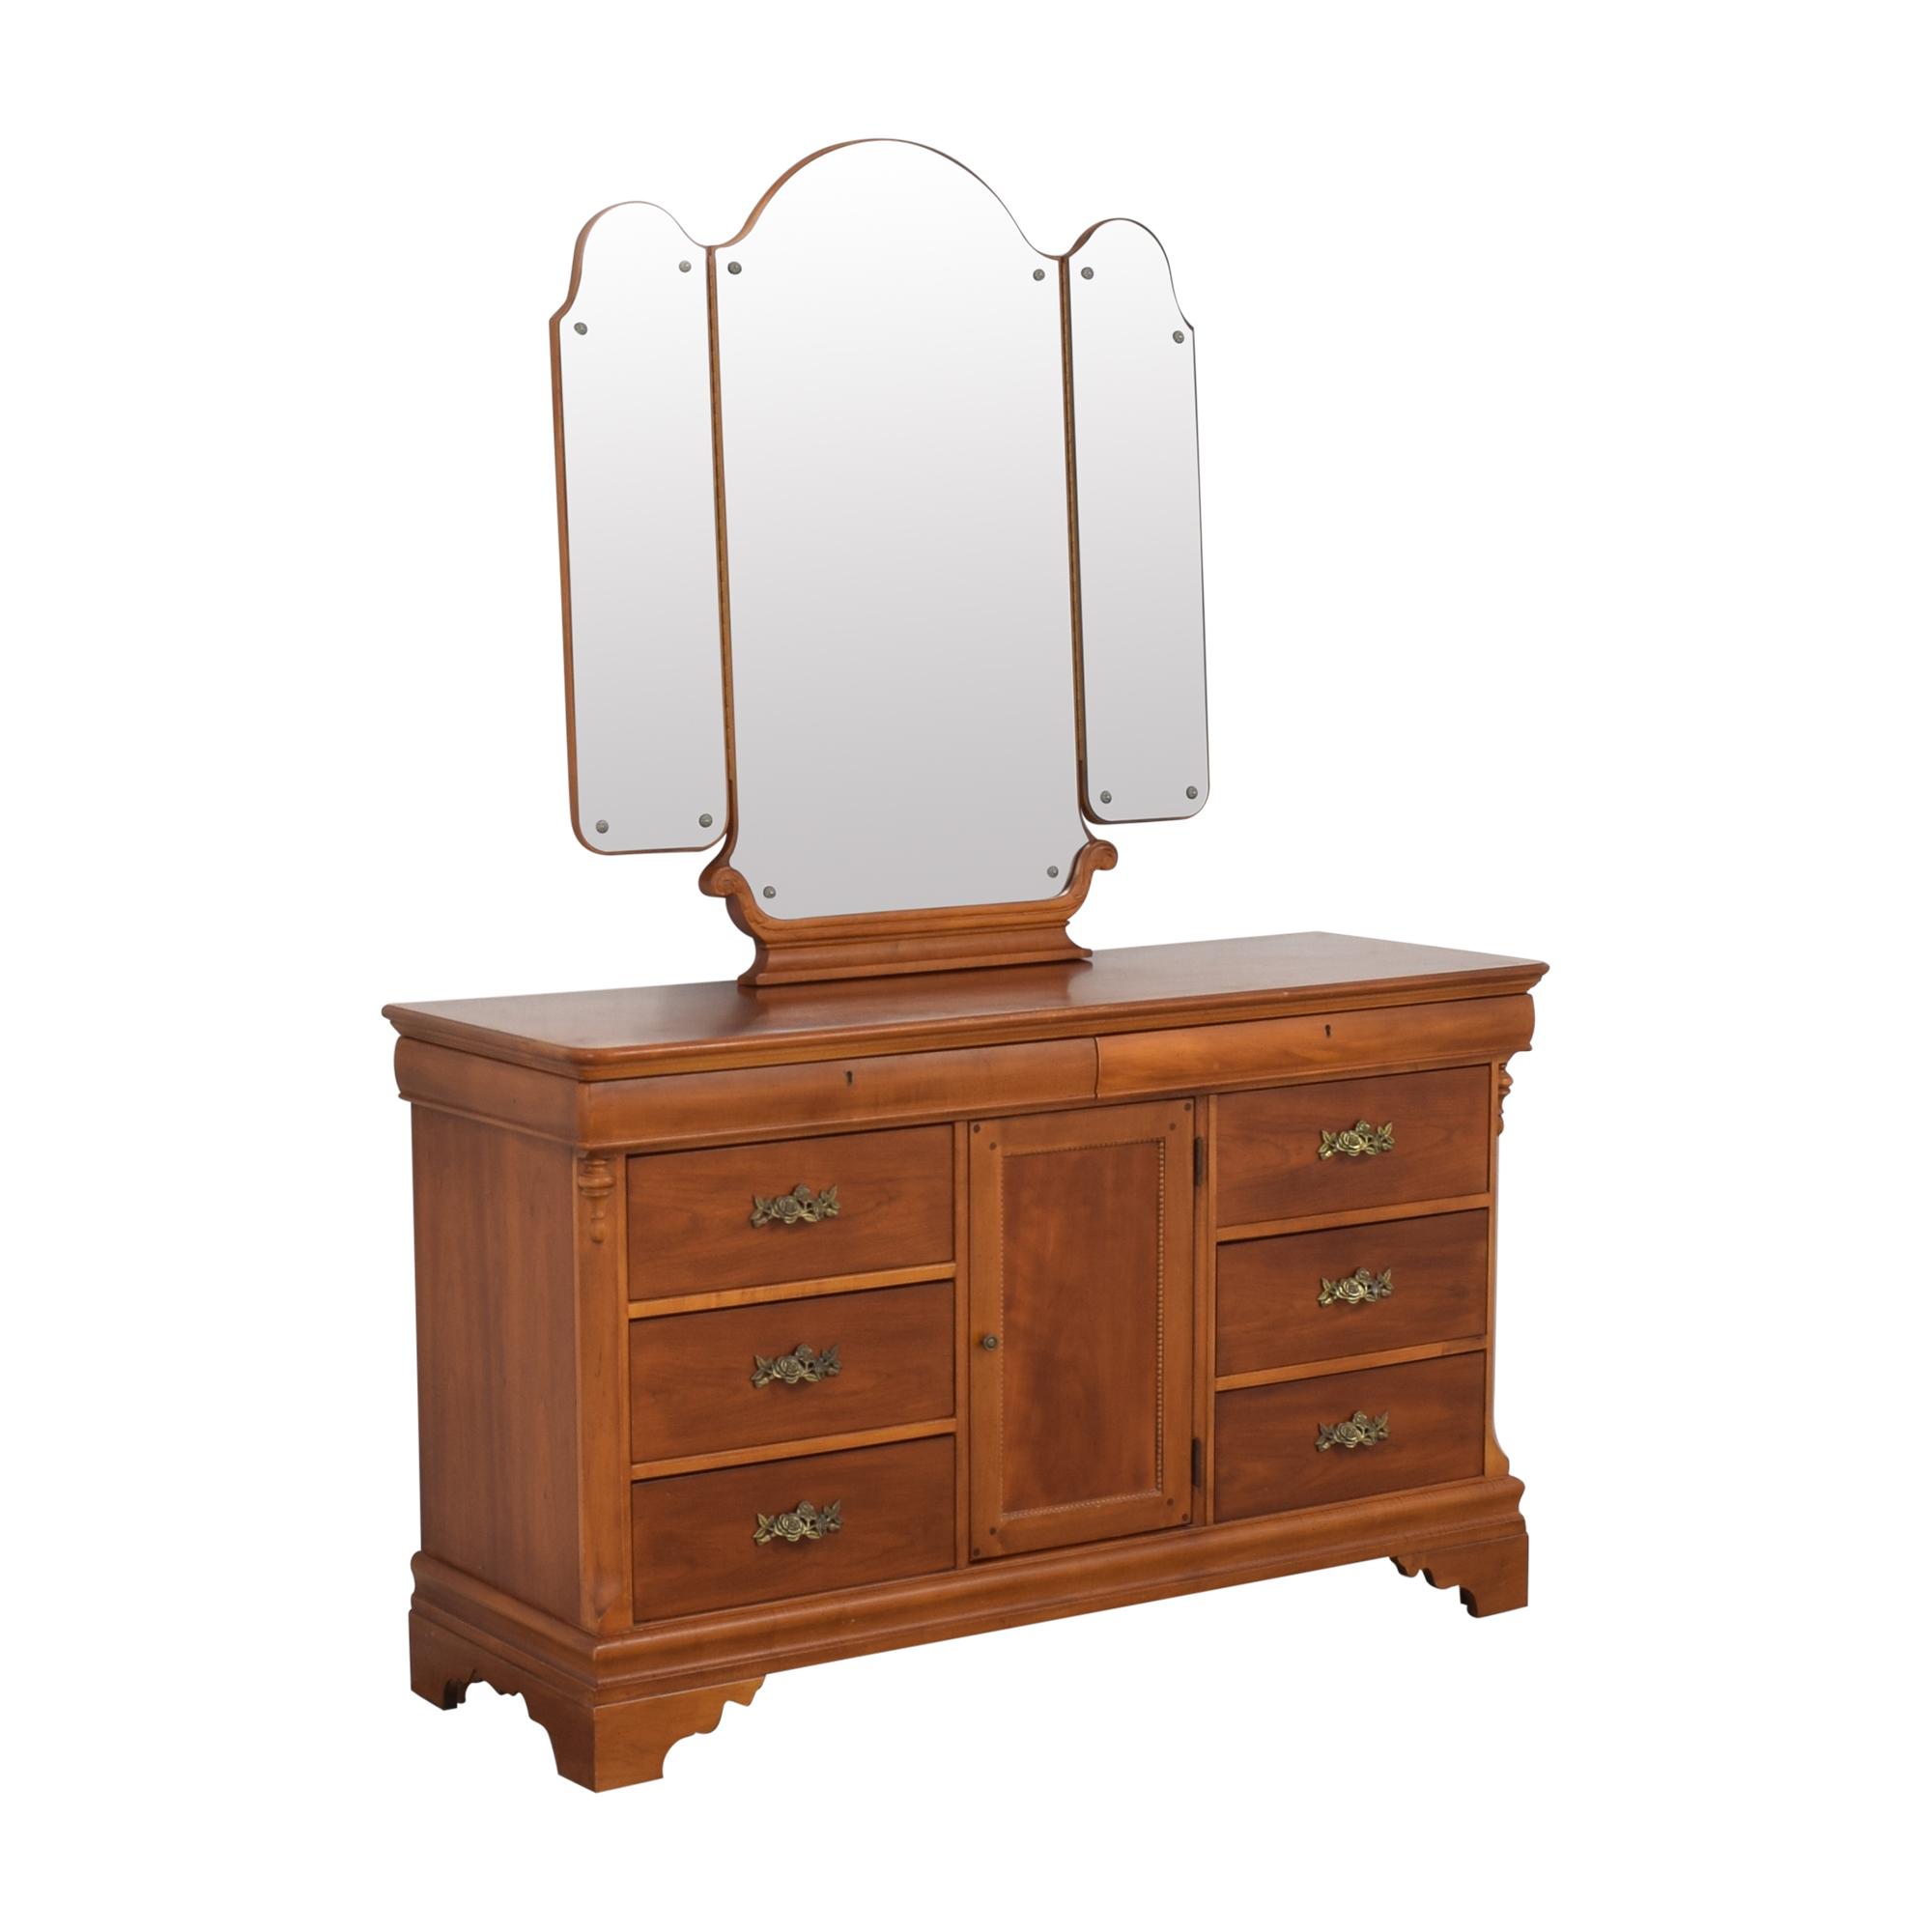 Lexington Furniture Betsy Cameron for Lexington Dresser with Mirror dimensions